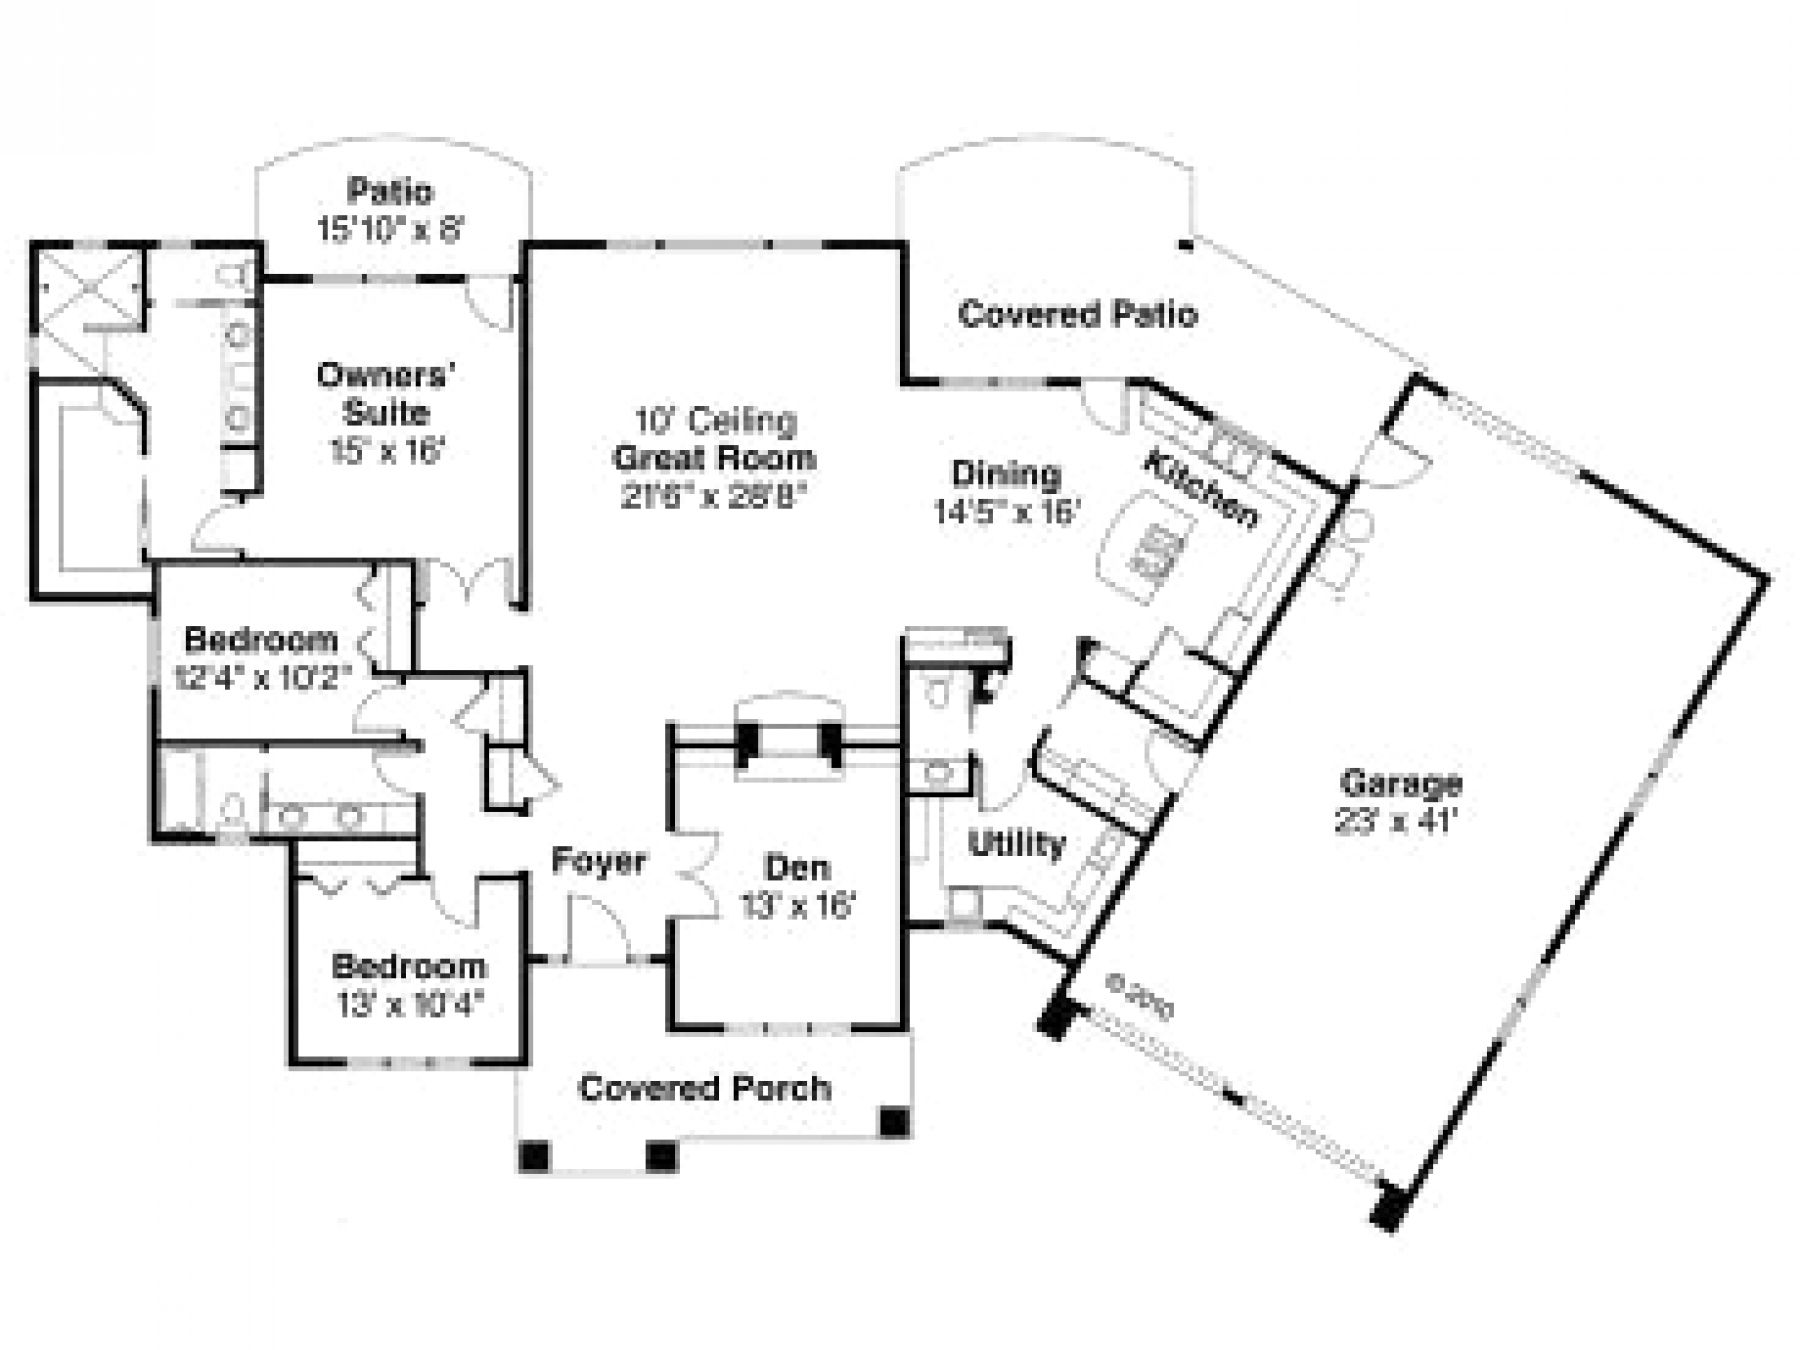 4 Car Garage House Plans Plan 3 | Prairie style houses ... Ranch House Plans Car on house plans garage, house plans 3 bed, house plans min, house plans 5 bed, house plans 2 bed, house plans 6 bed,